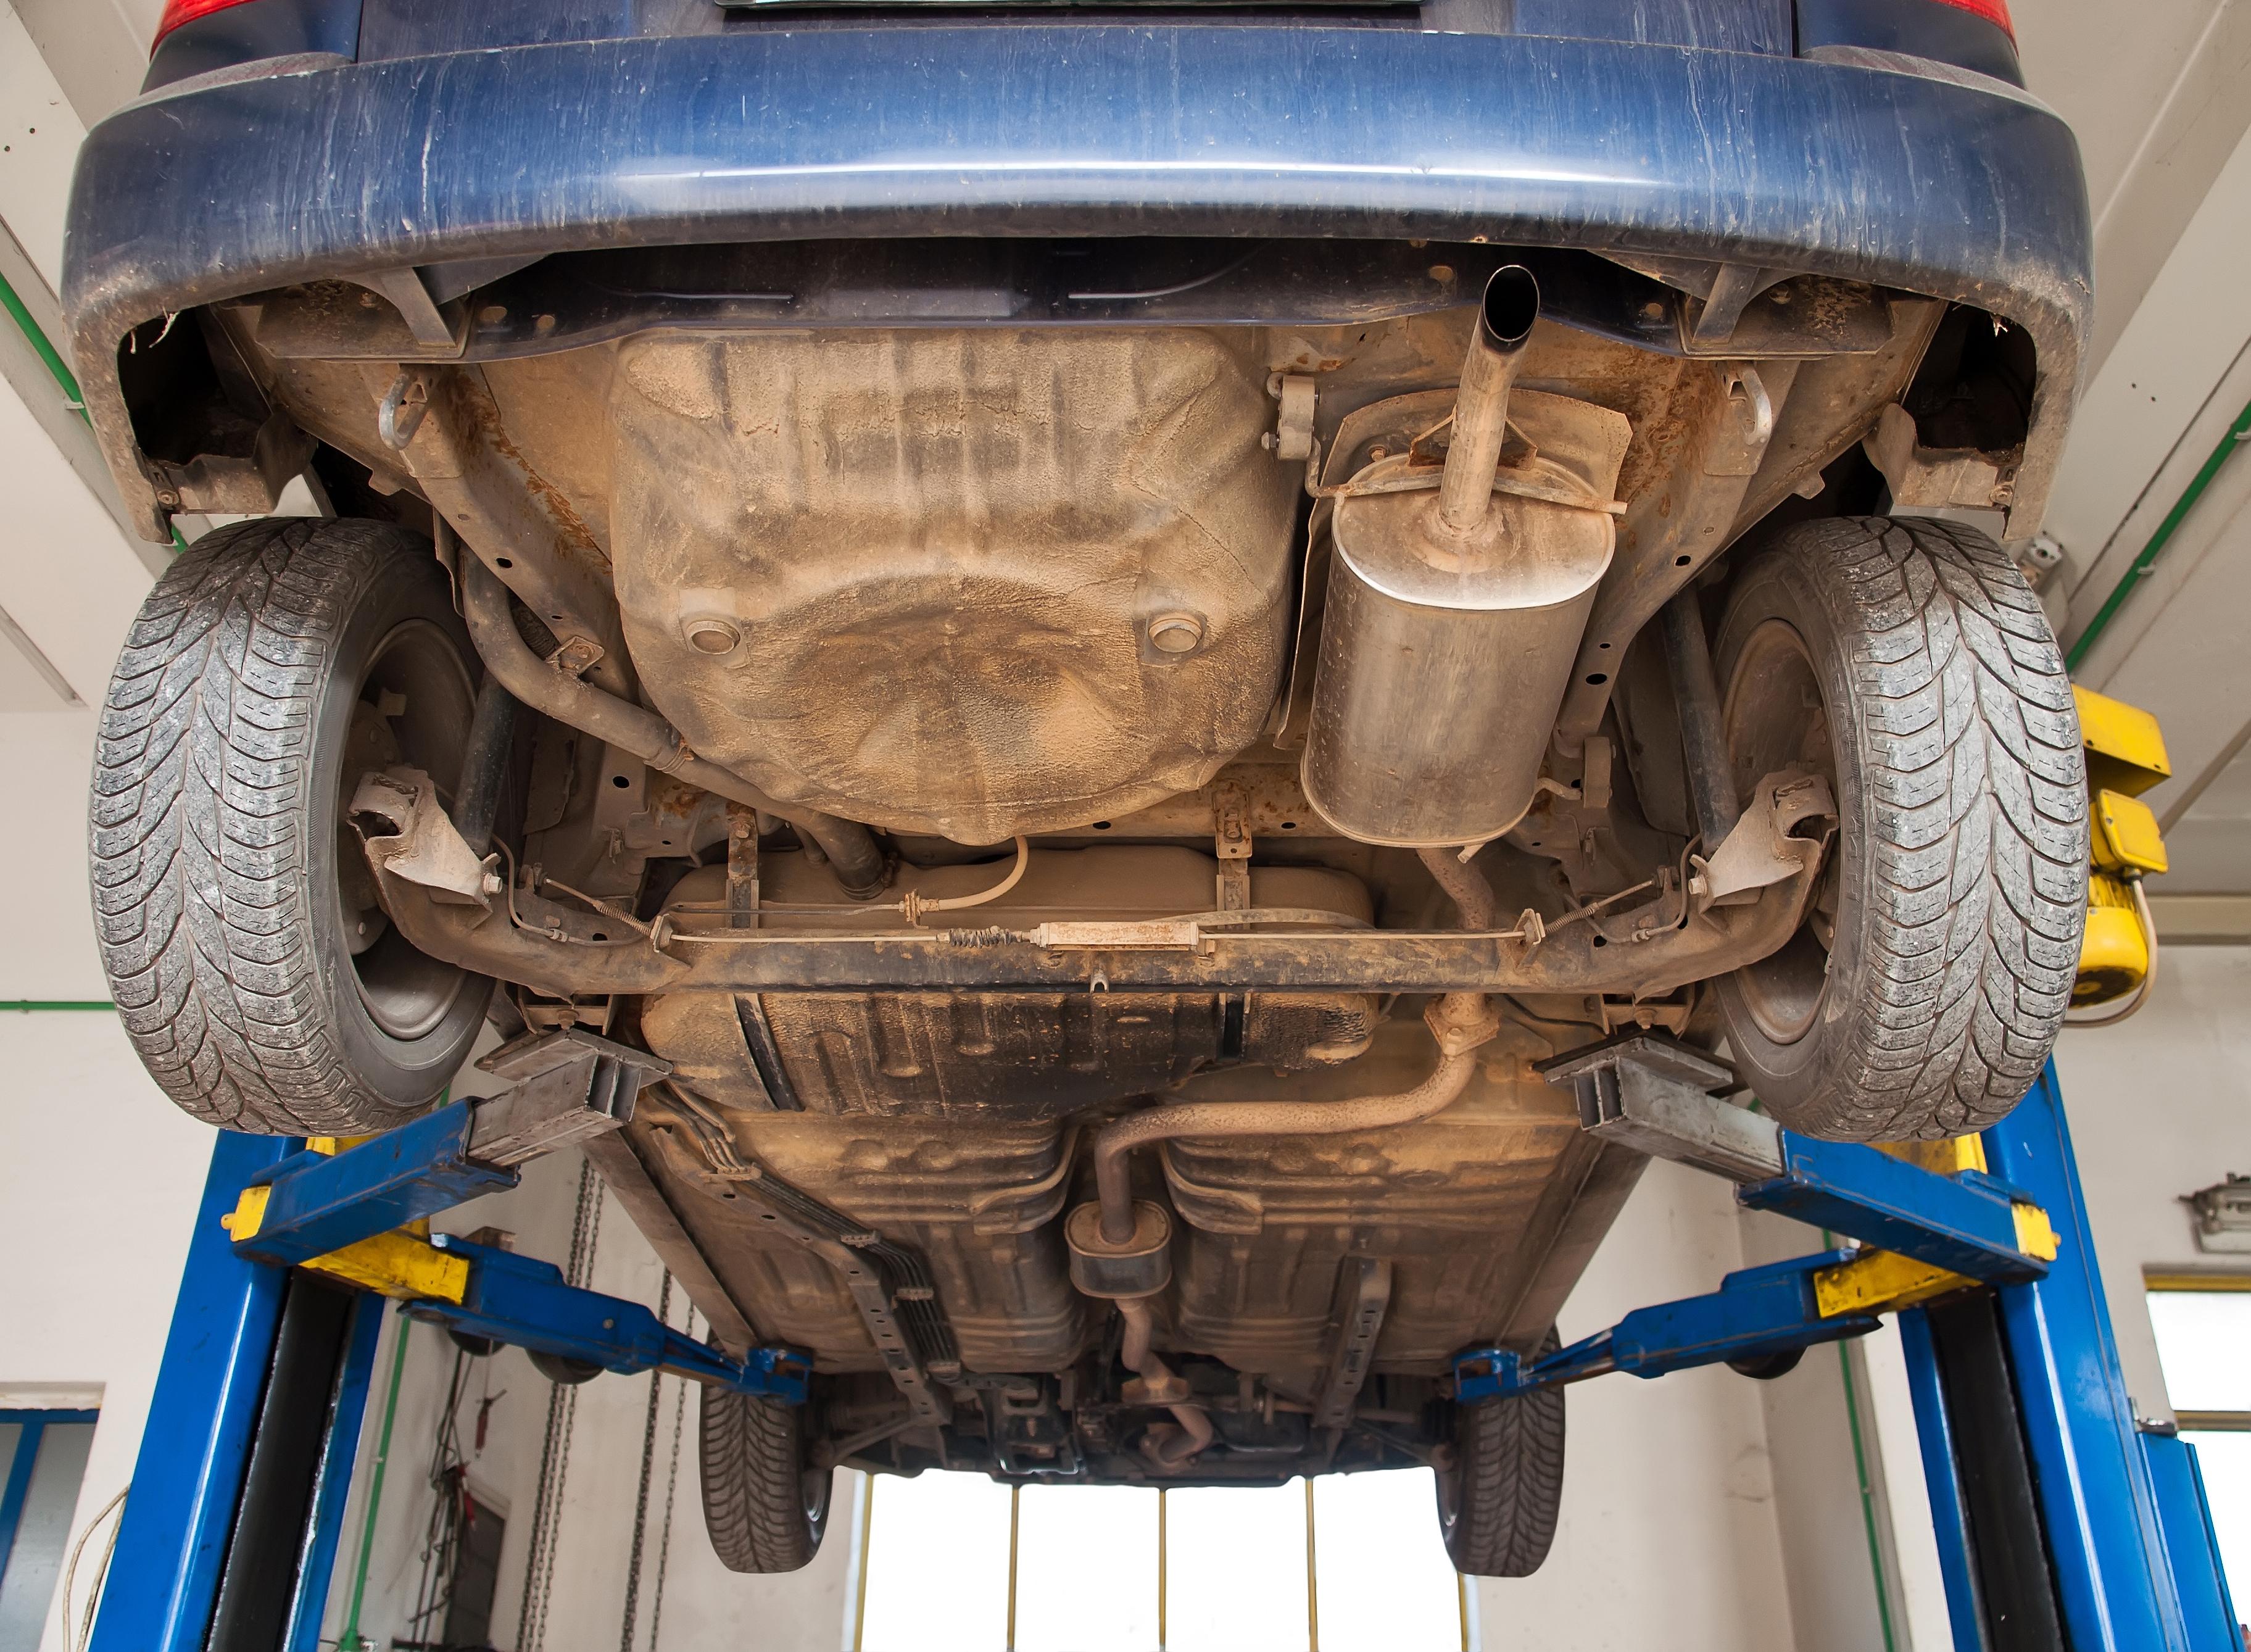 GM Fuel System Services near Wolcott at Ascent Automotive Avon